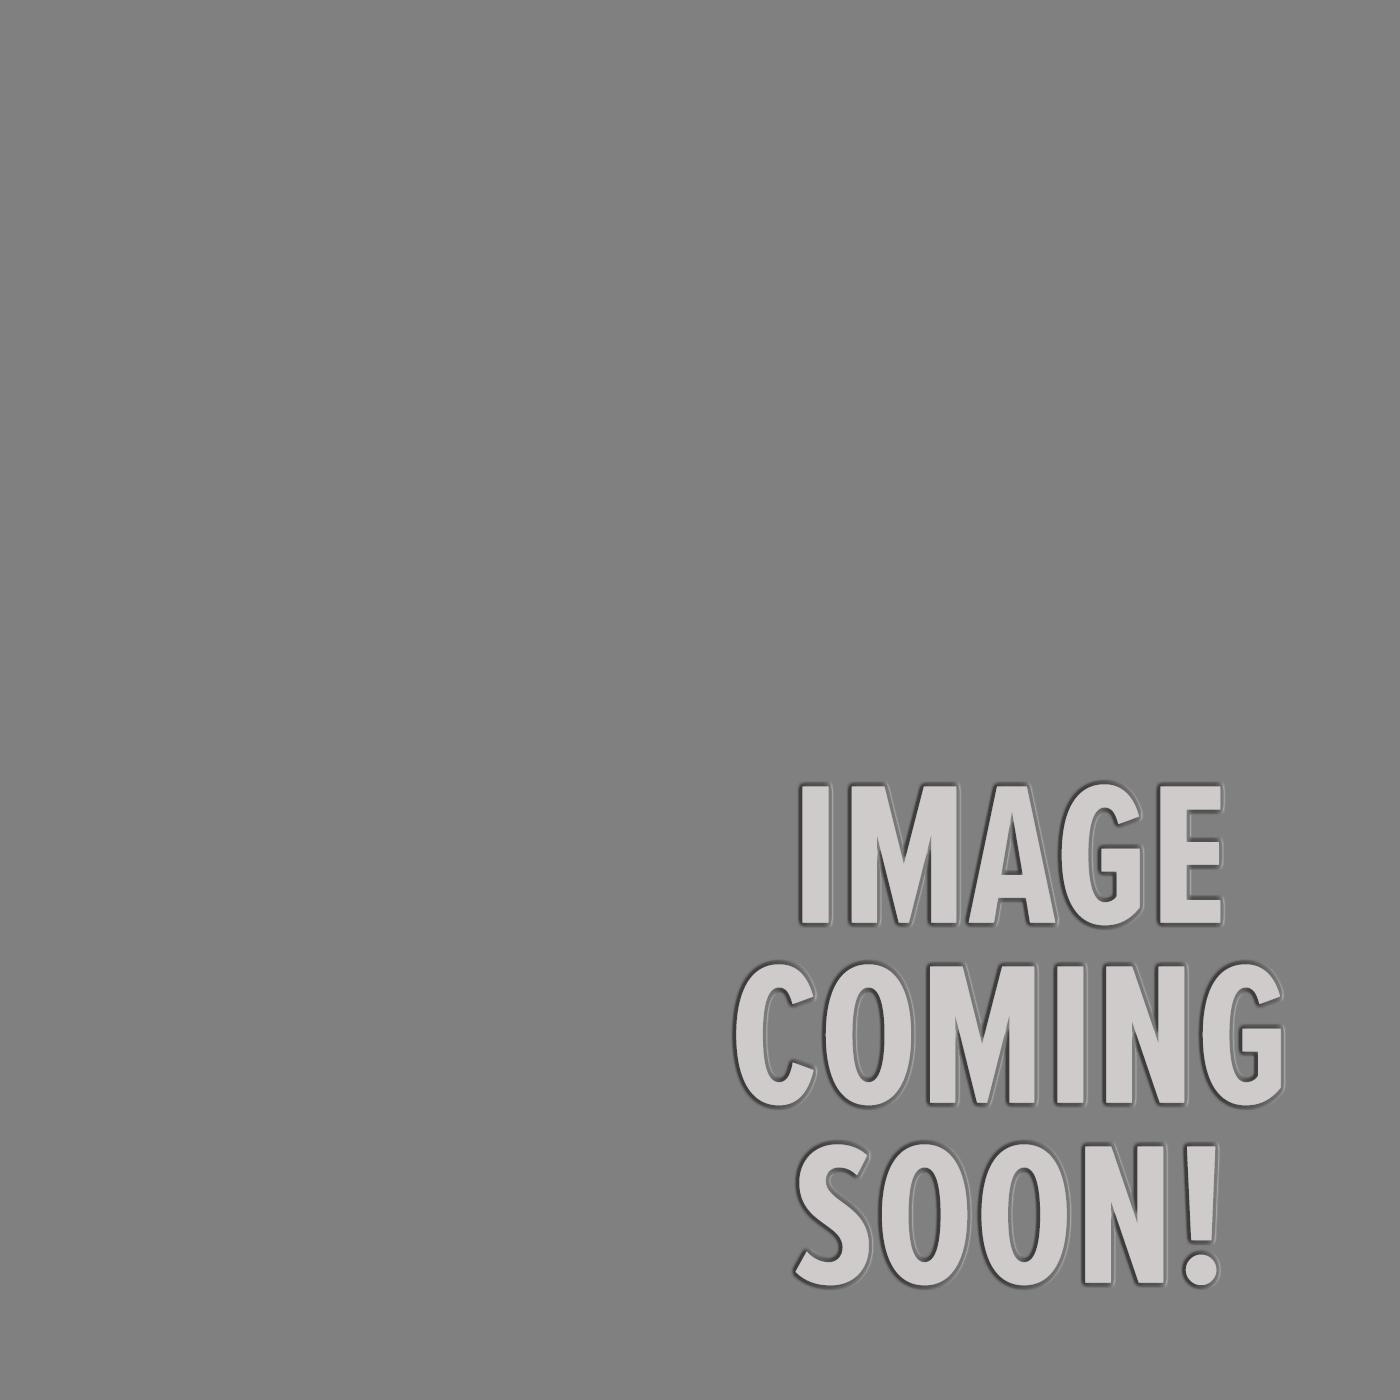 D'Addario EJ27H Student Nylon Classical Guitar Strings, Hard Tension